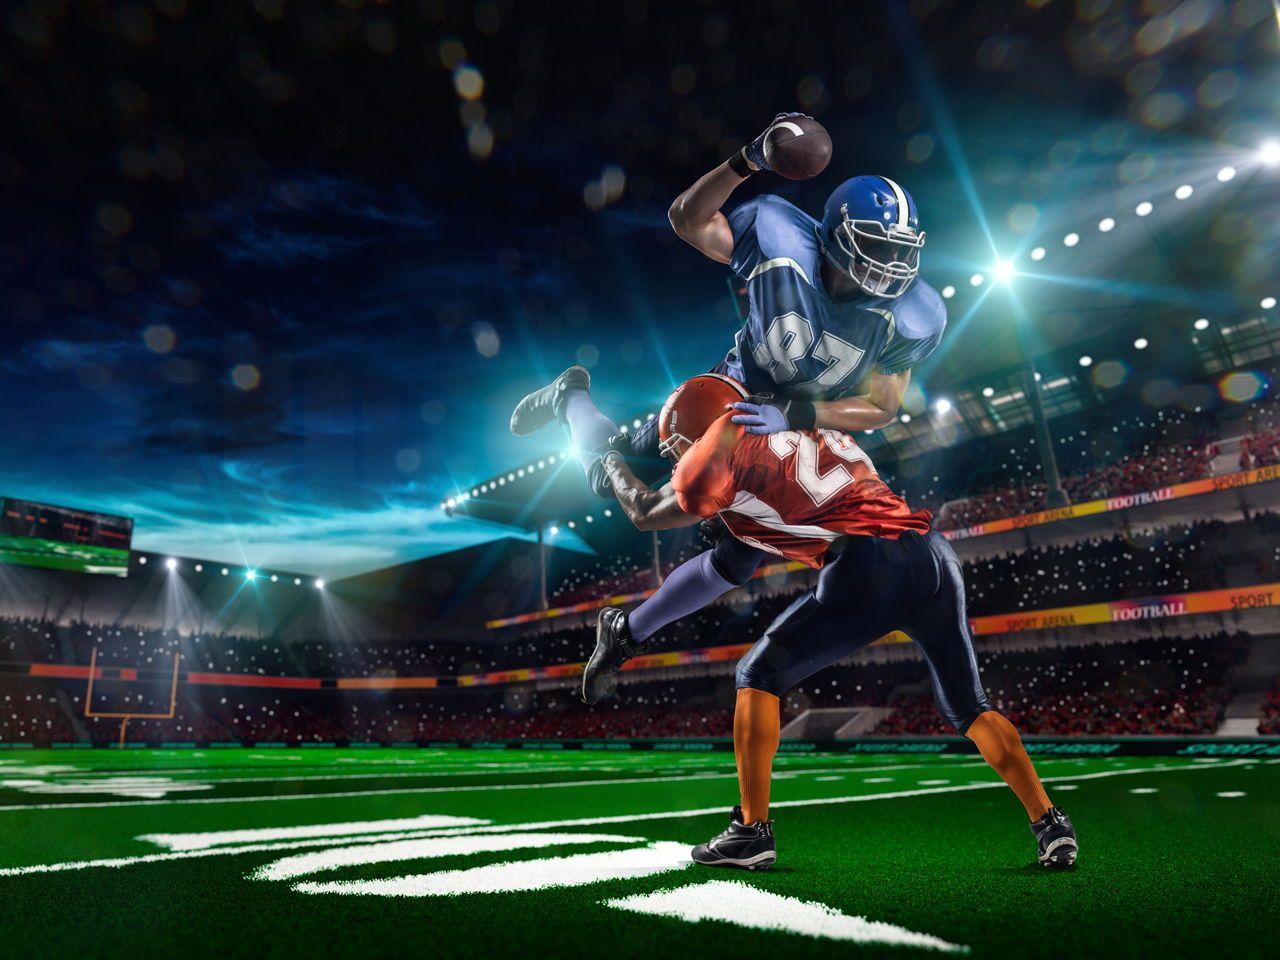 American Football American football players, Sports